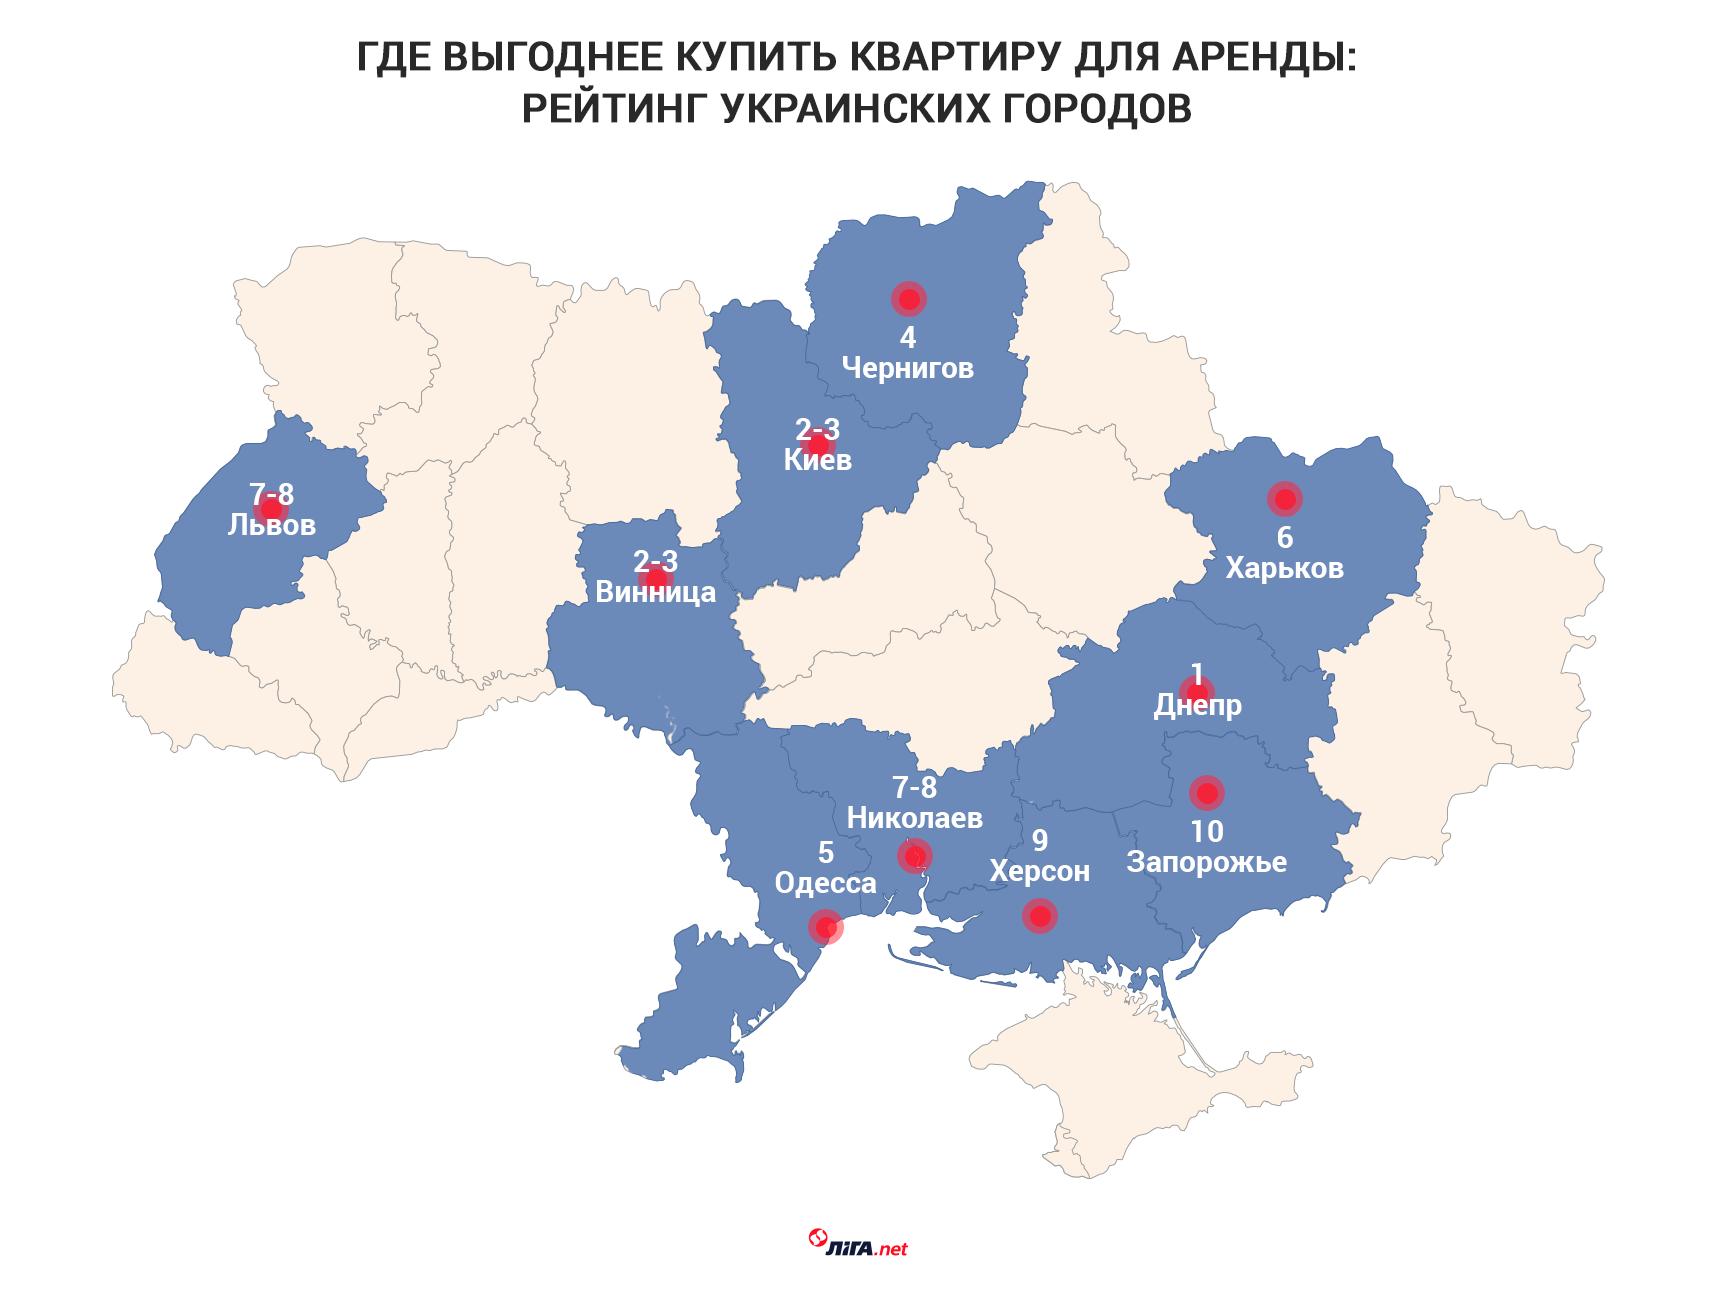 Инфографика LIGA.net